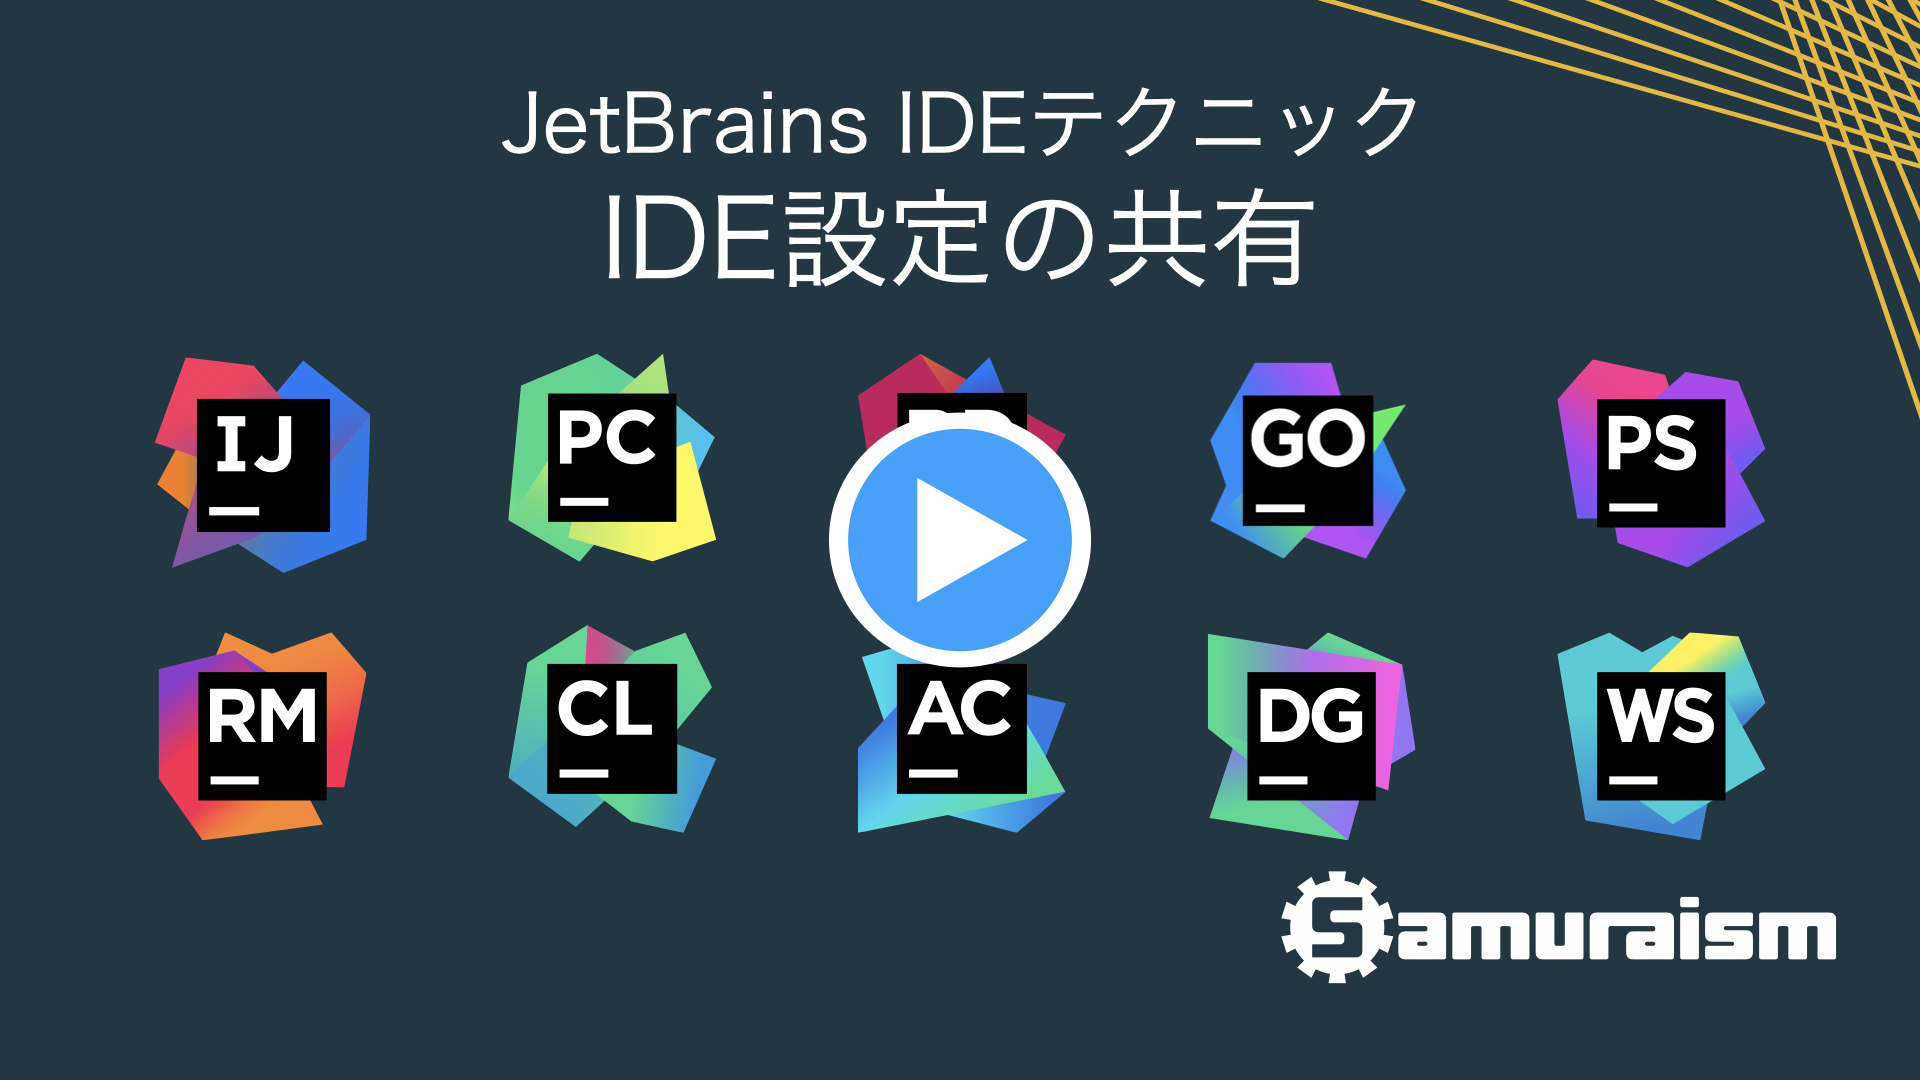 #JetBrainsIDEテクニック – IDE設定の共有